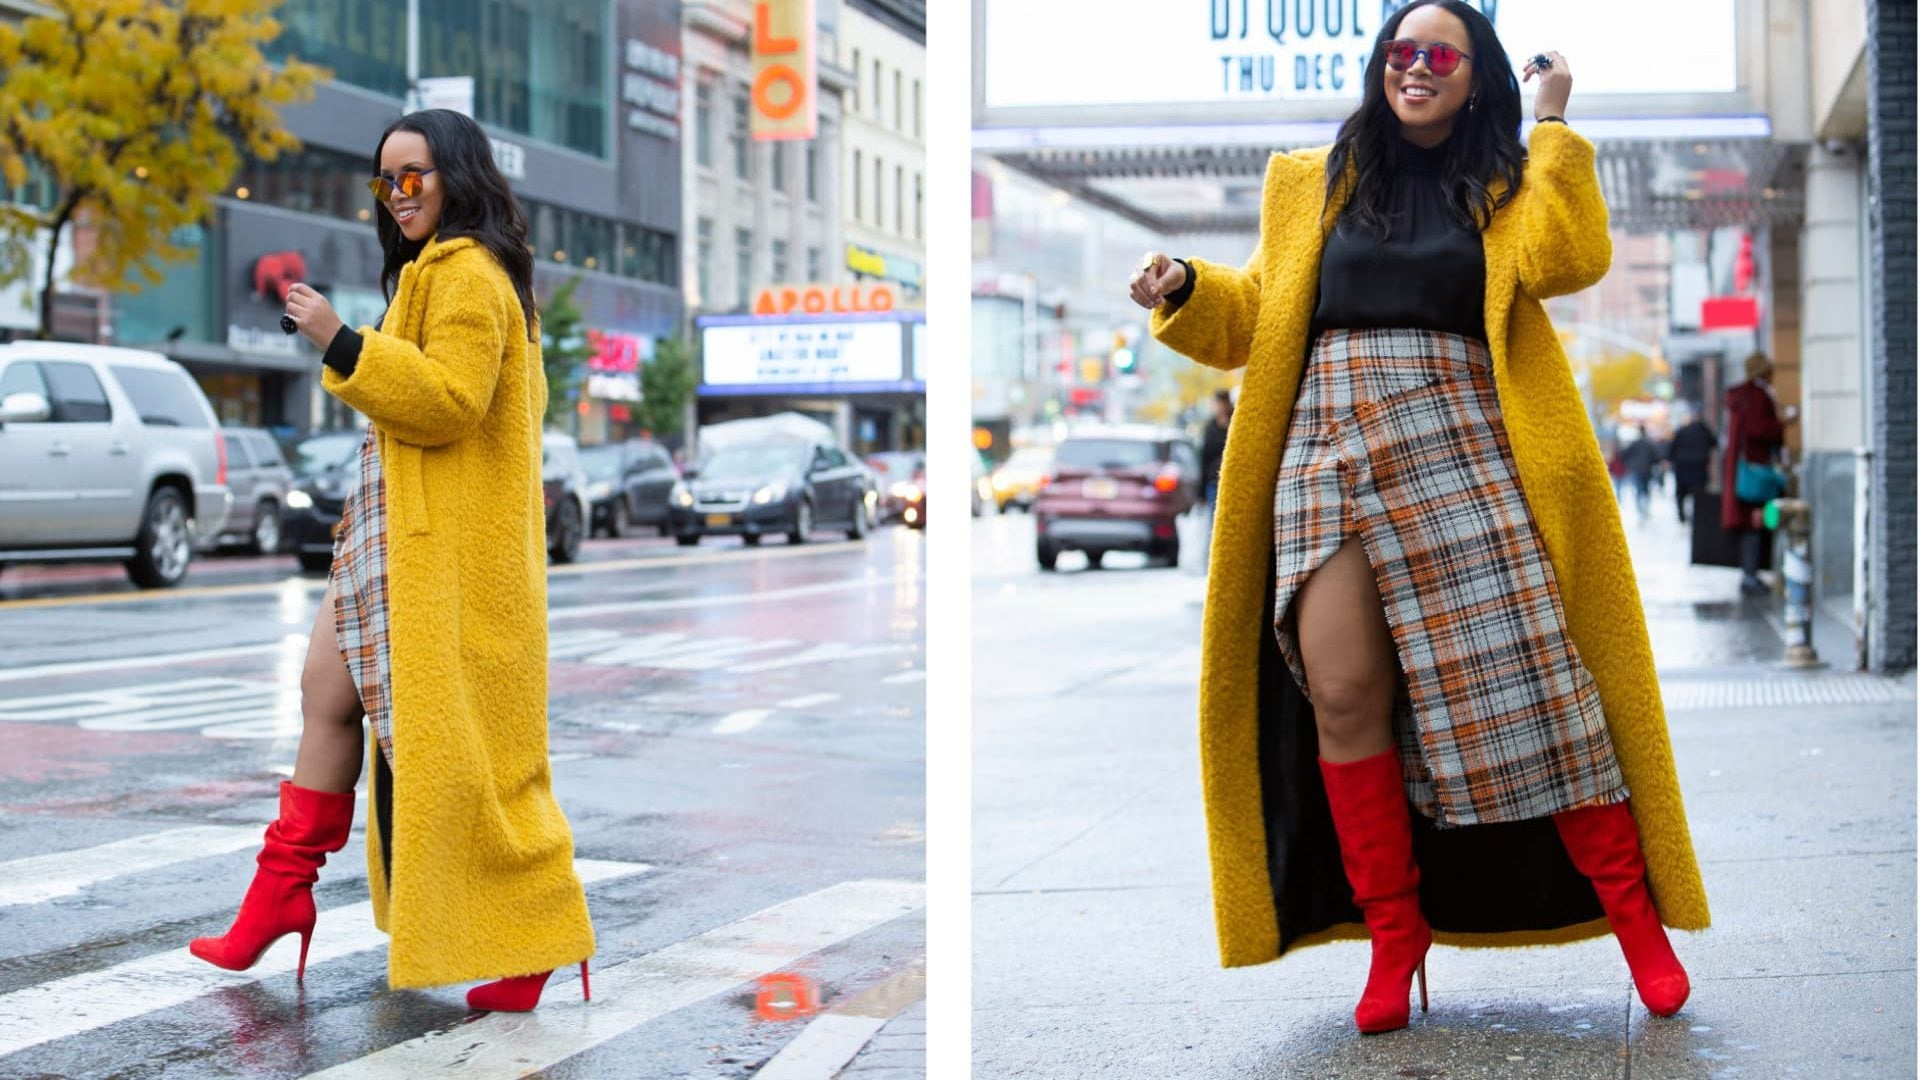 How To Make Power Moves Like A Fashion Influencer